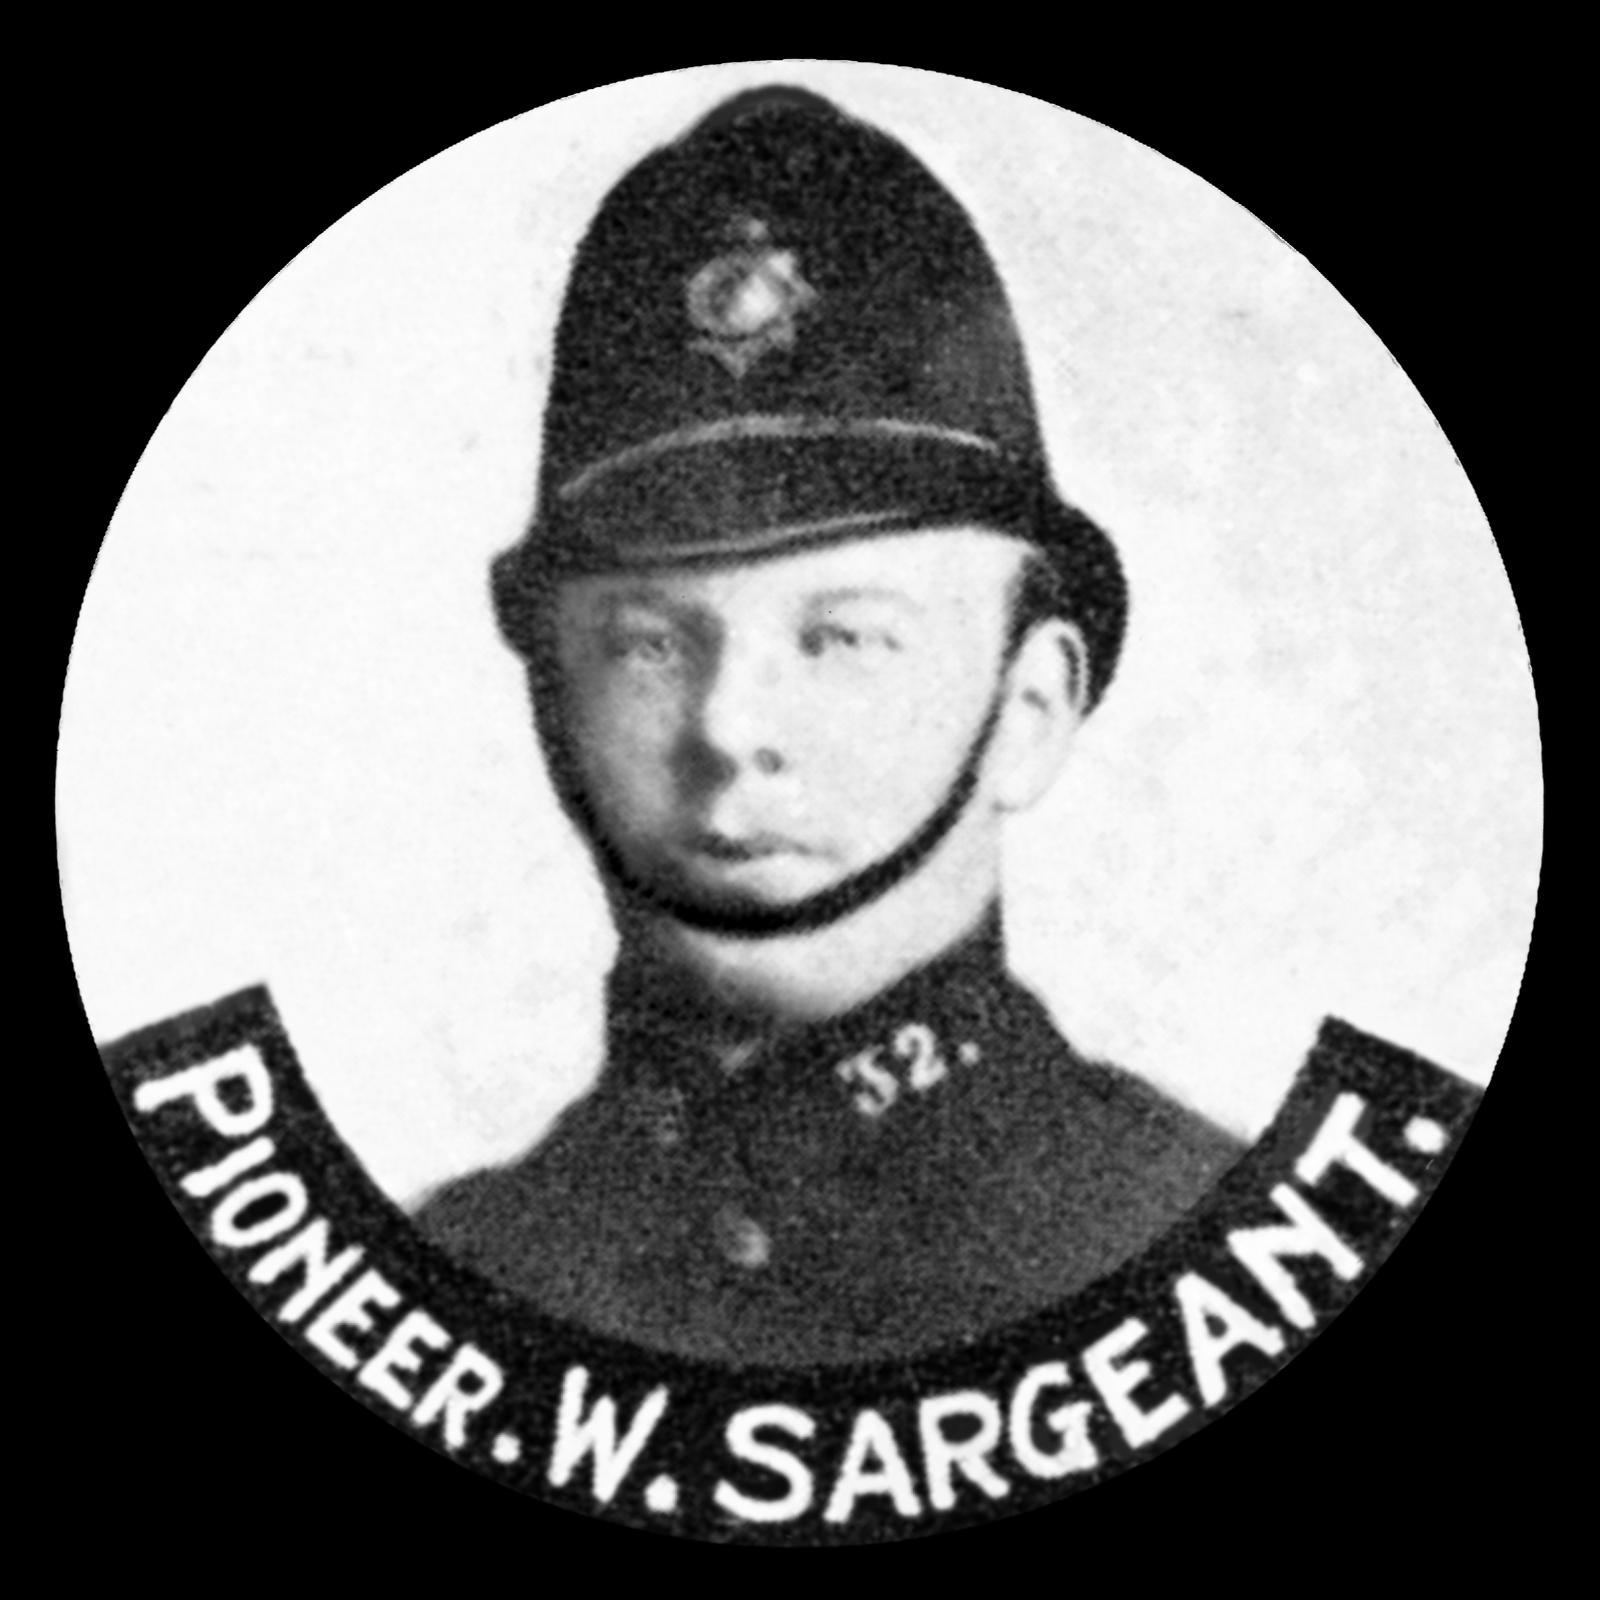 SARGEANT Walter